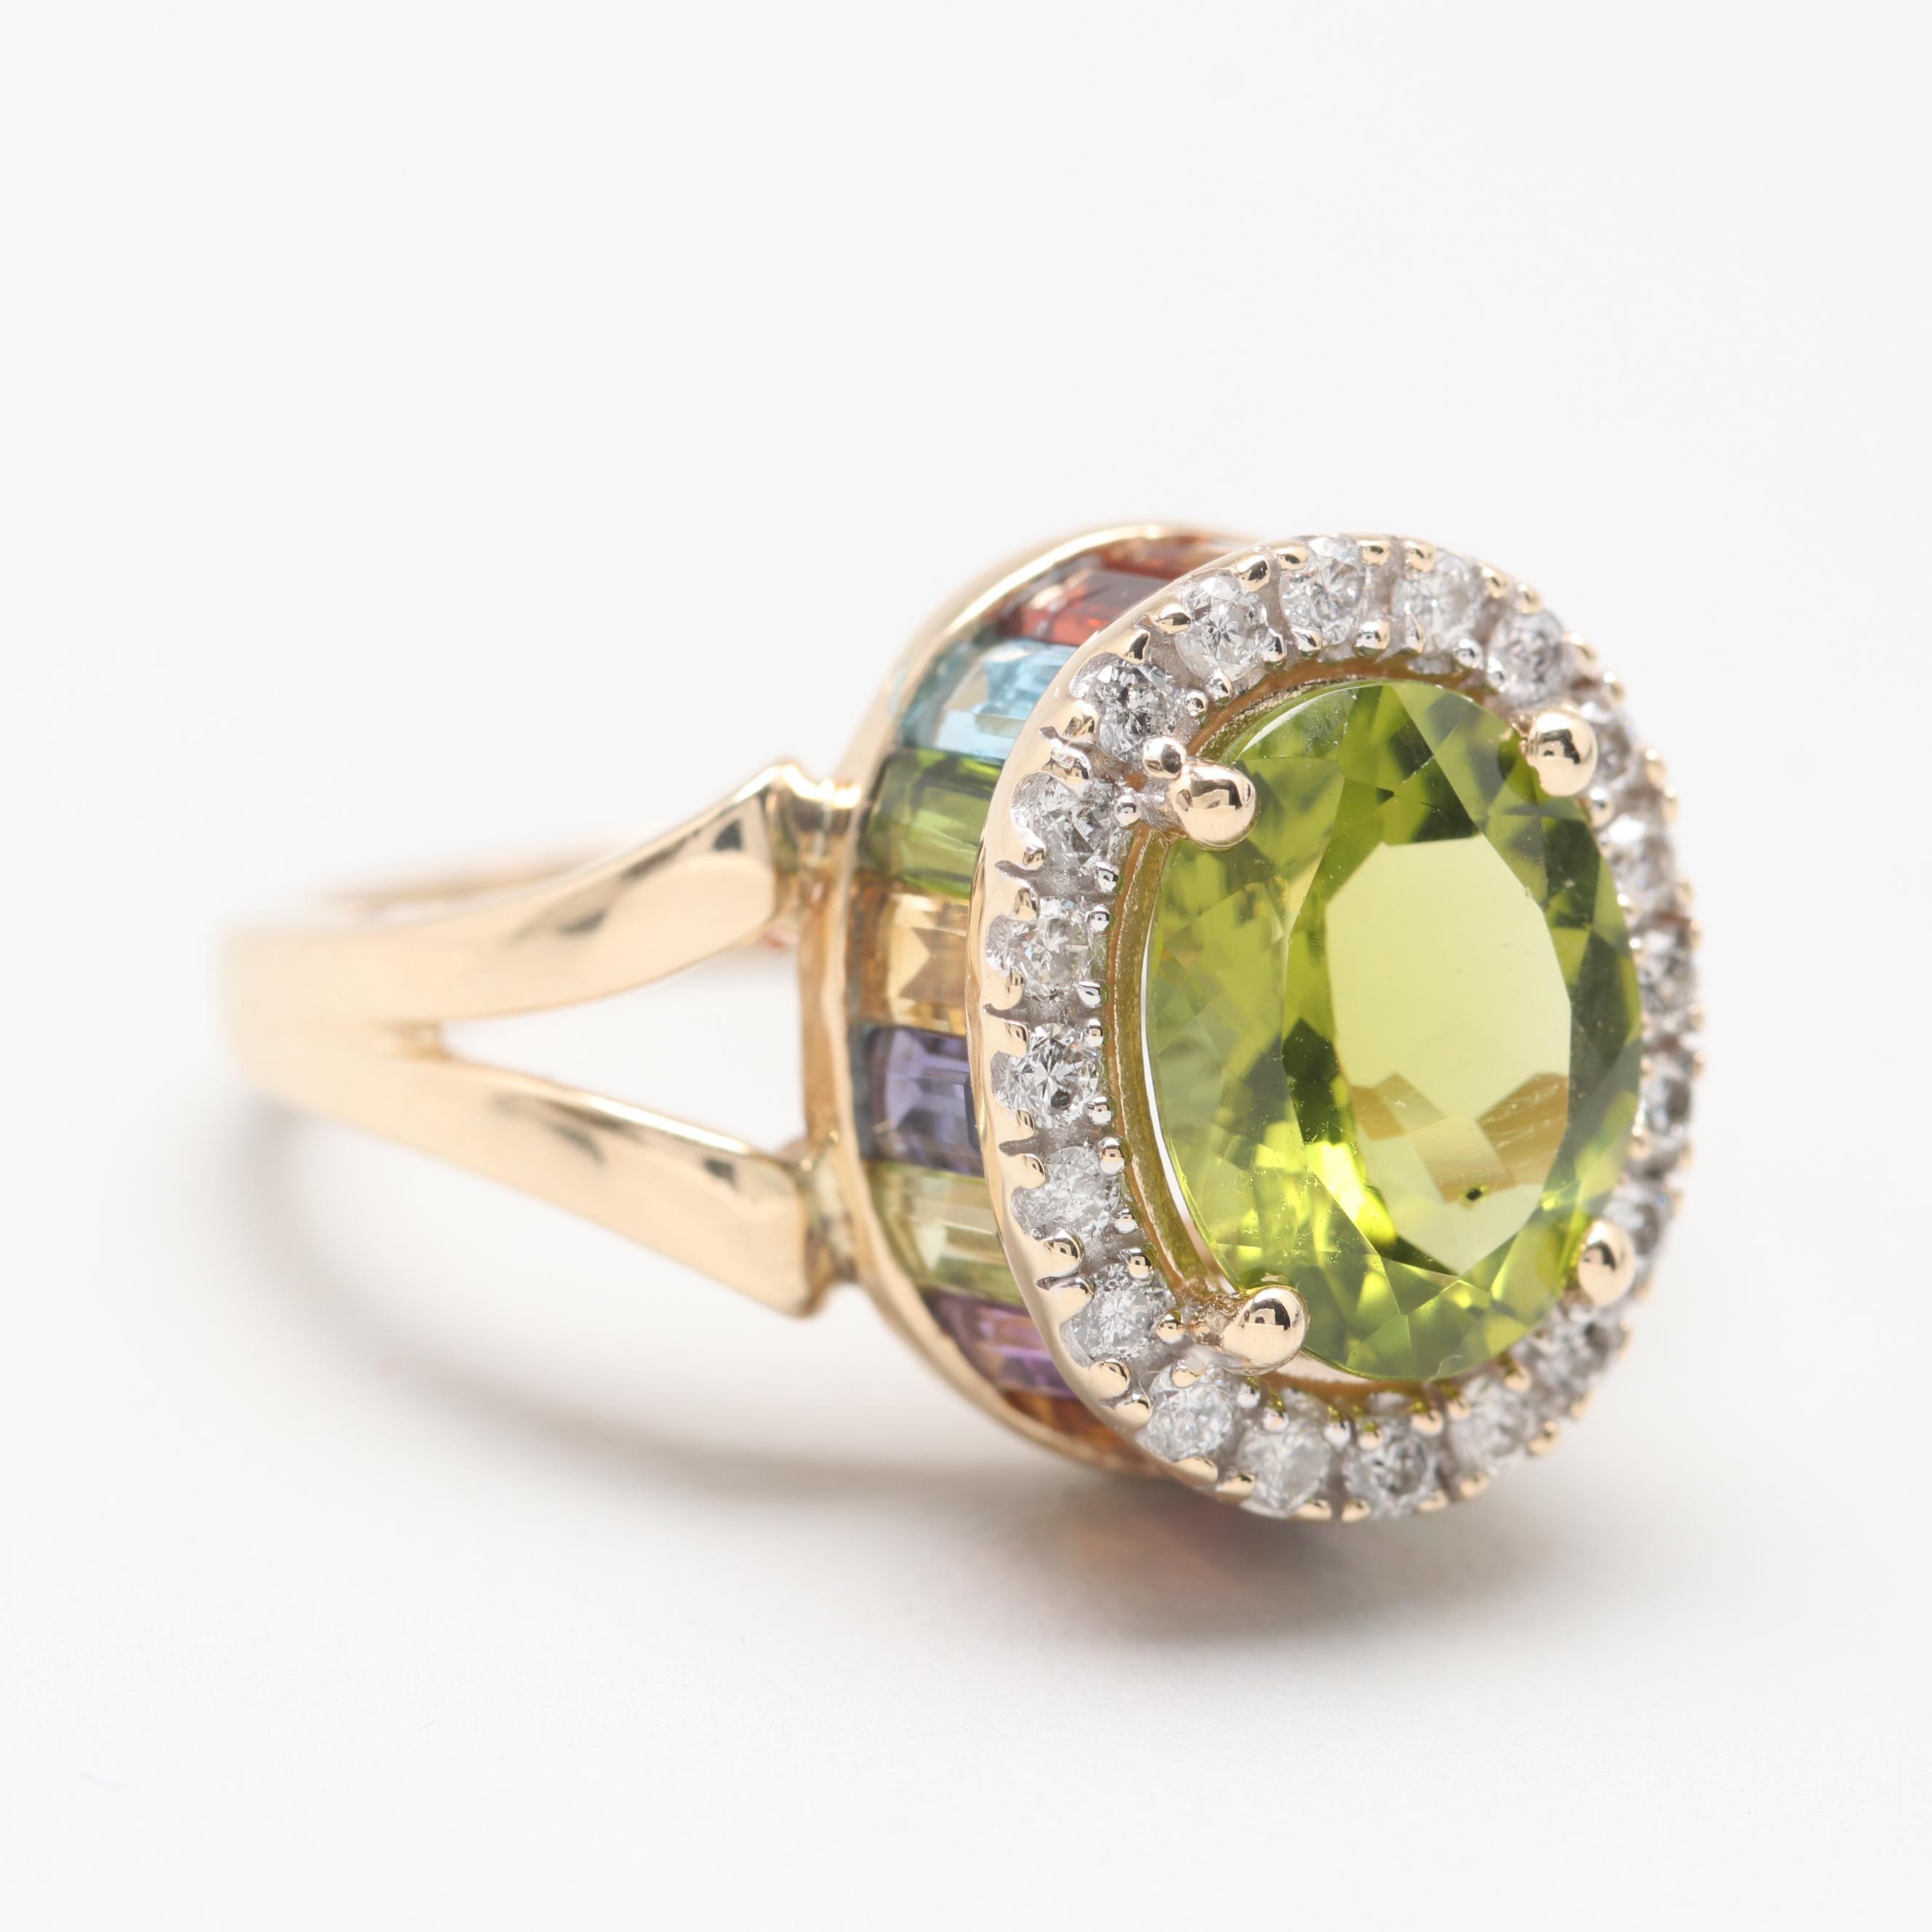 14K Yellow Gold Peridot, Diamond, and Gemstone Ring